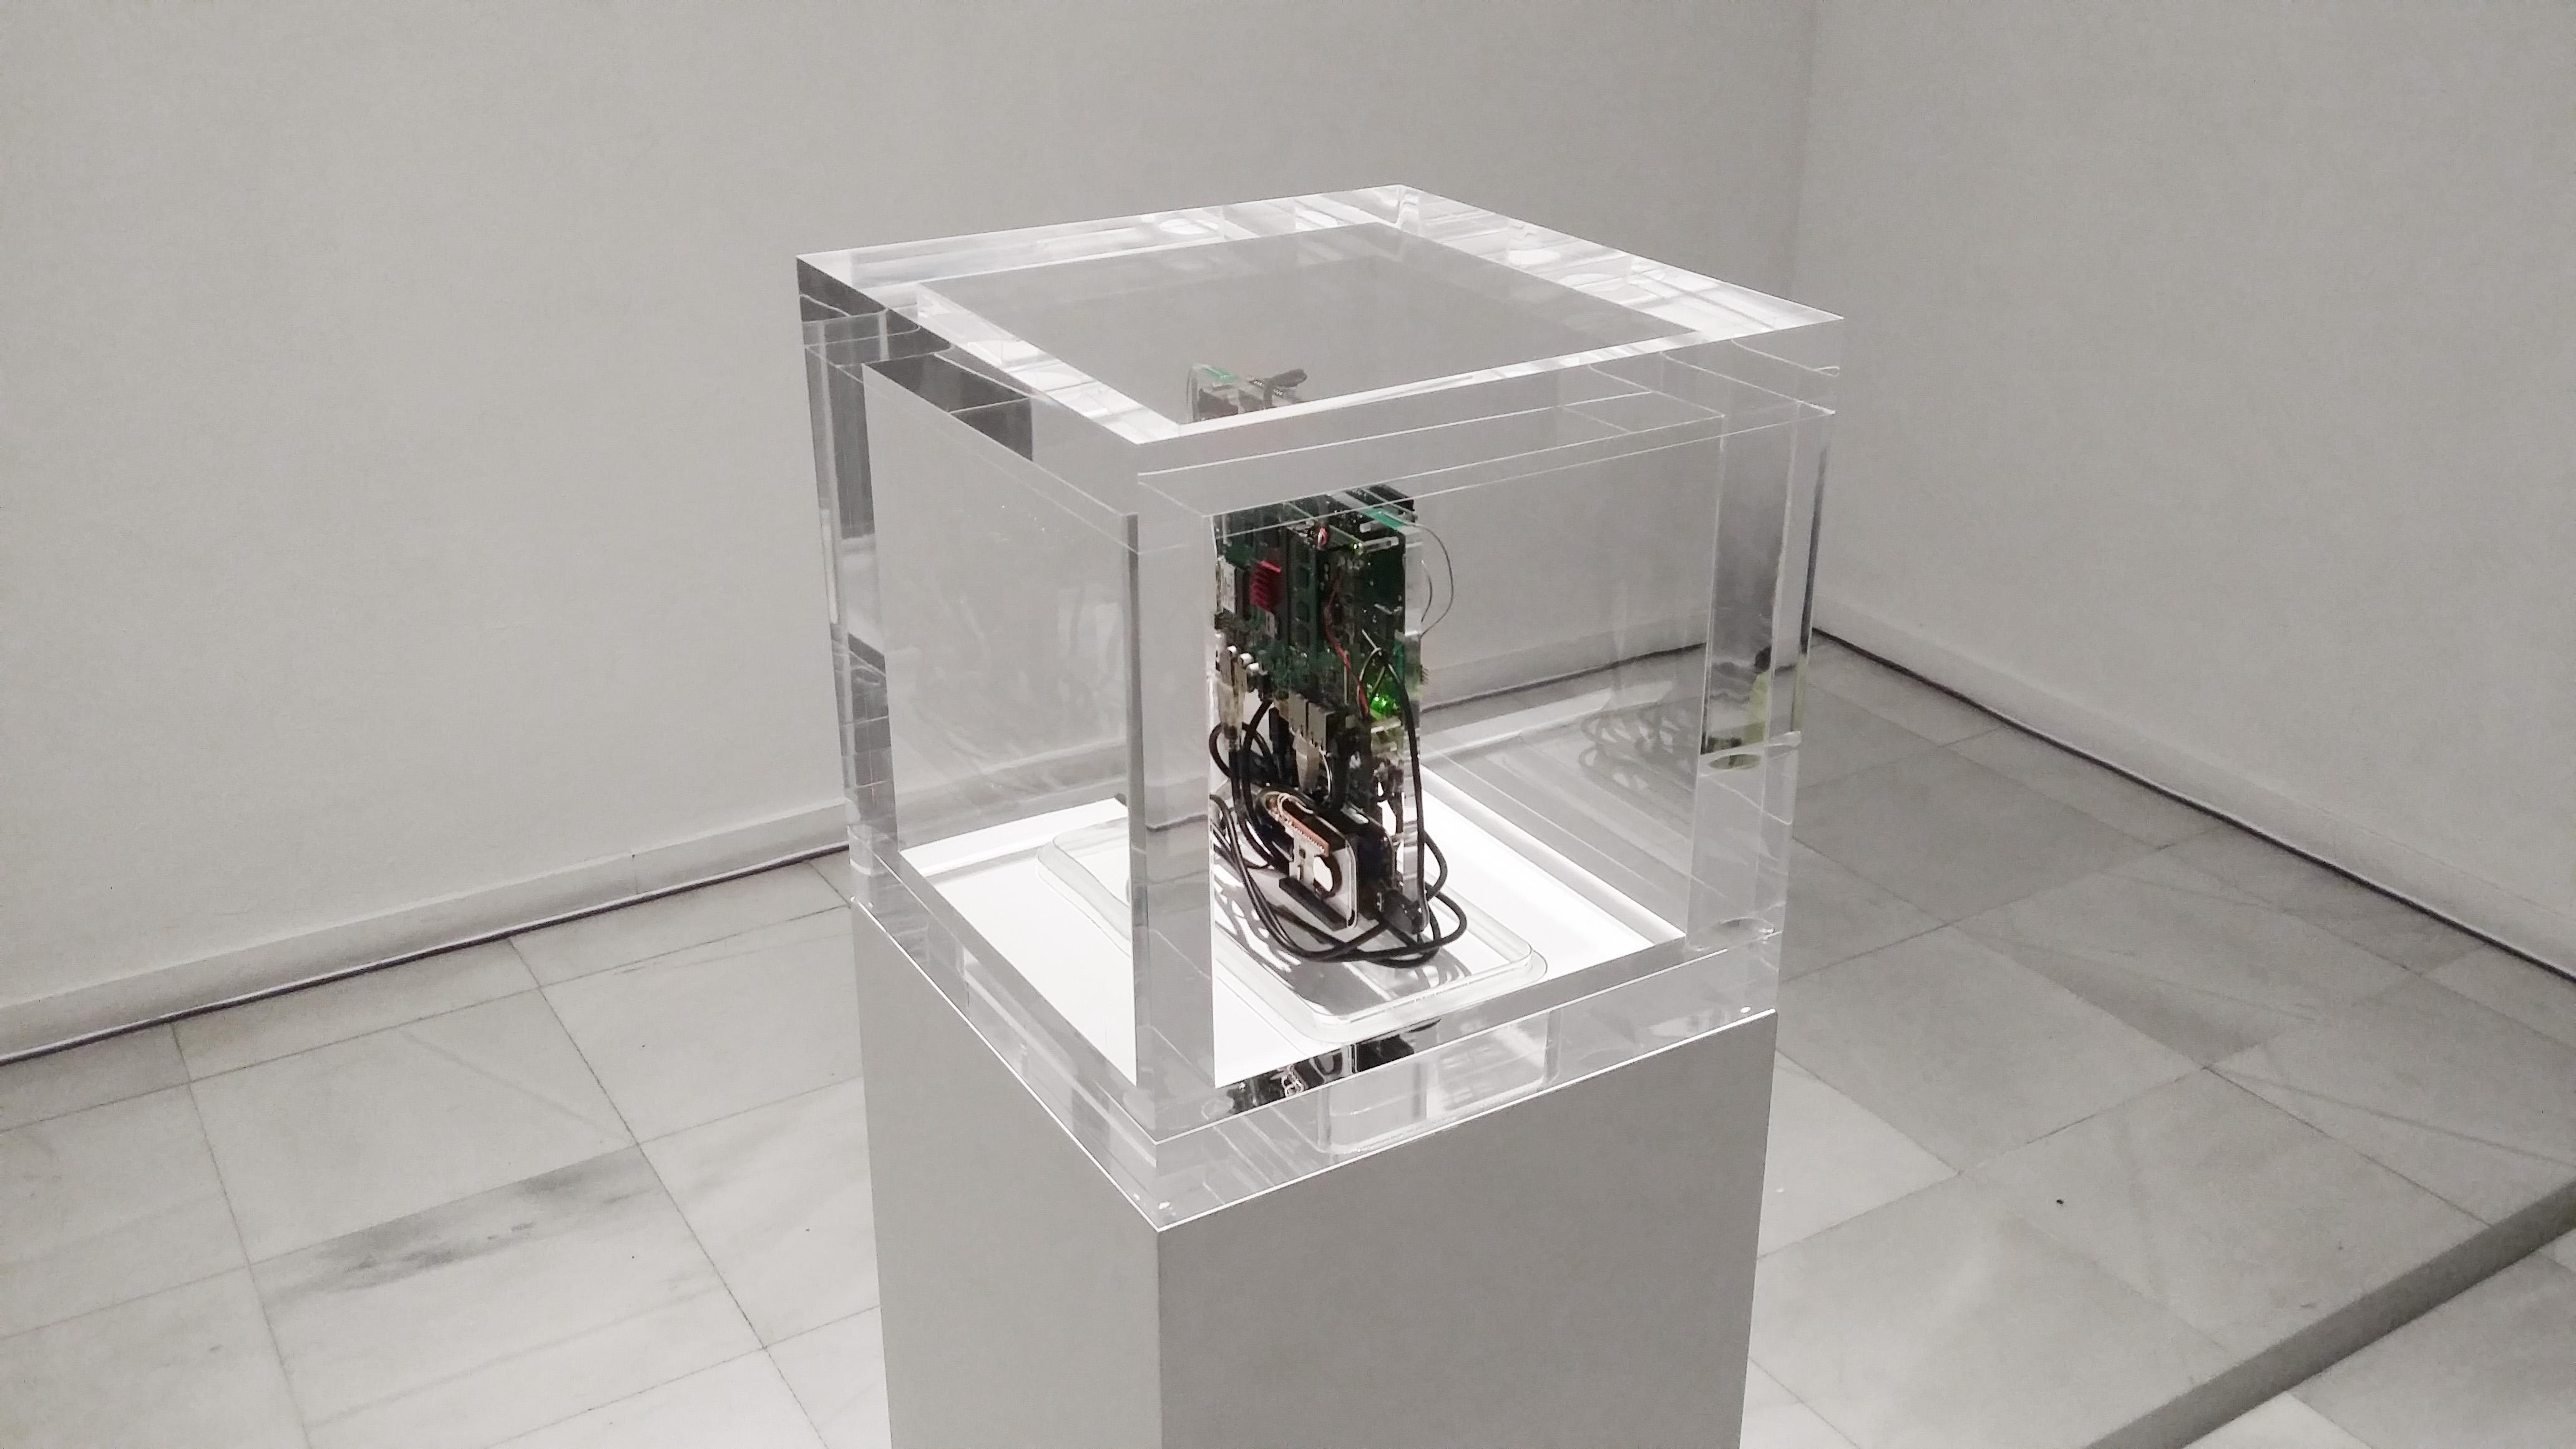 The Autonomy Cube